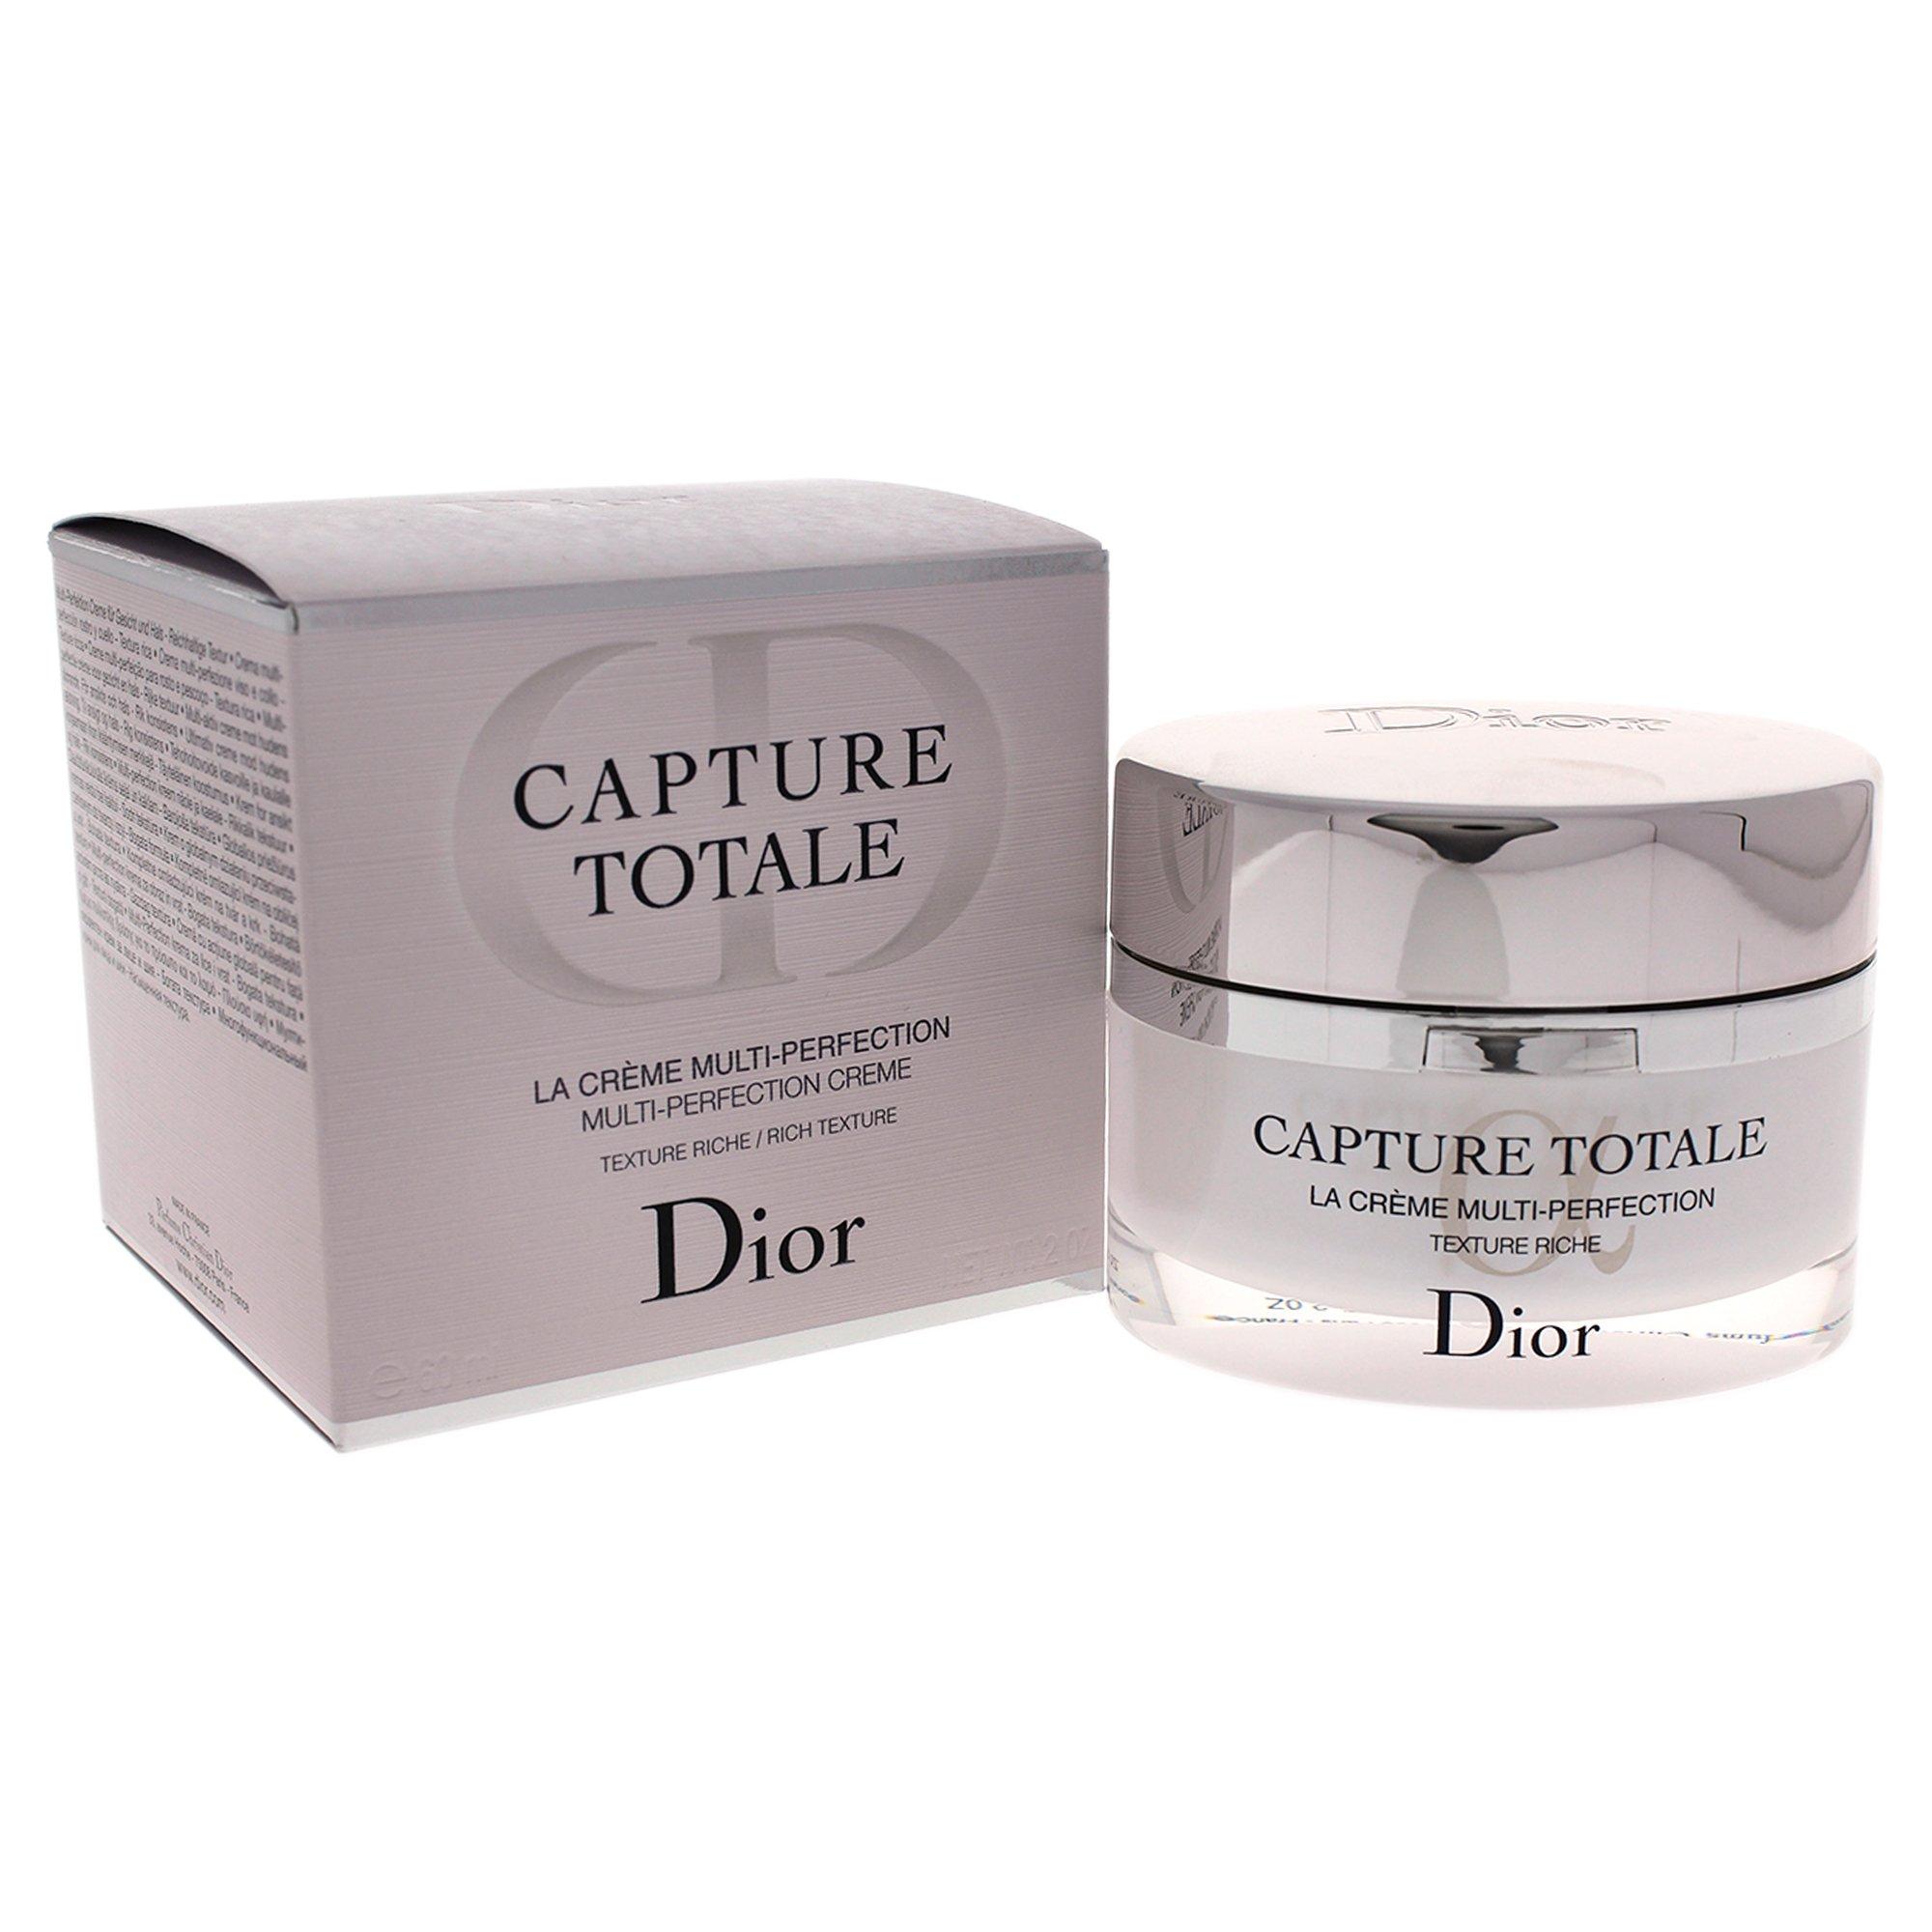 Amazon.com: Christian Dior Capture Totale Multi Perfection Creme, Rich  Texture for Women, 2 Ounce: Beauty